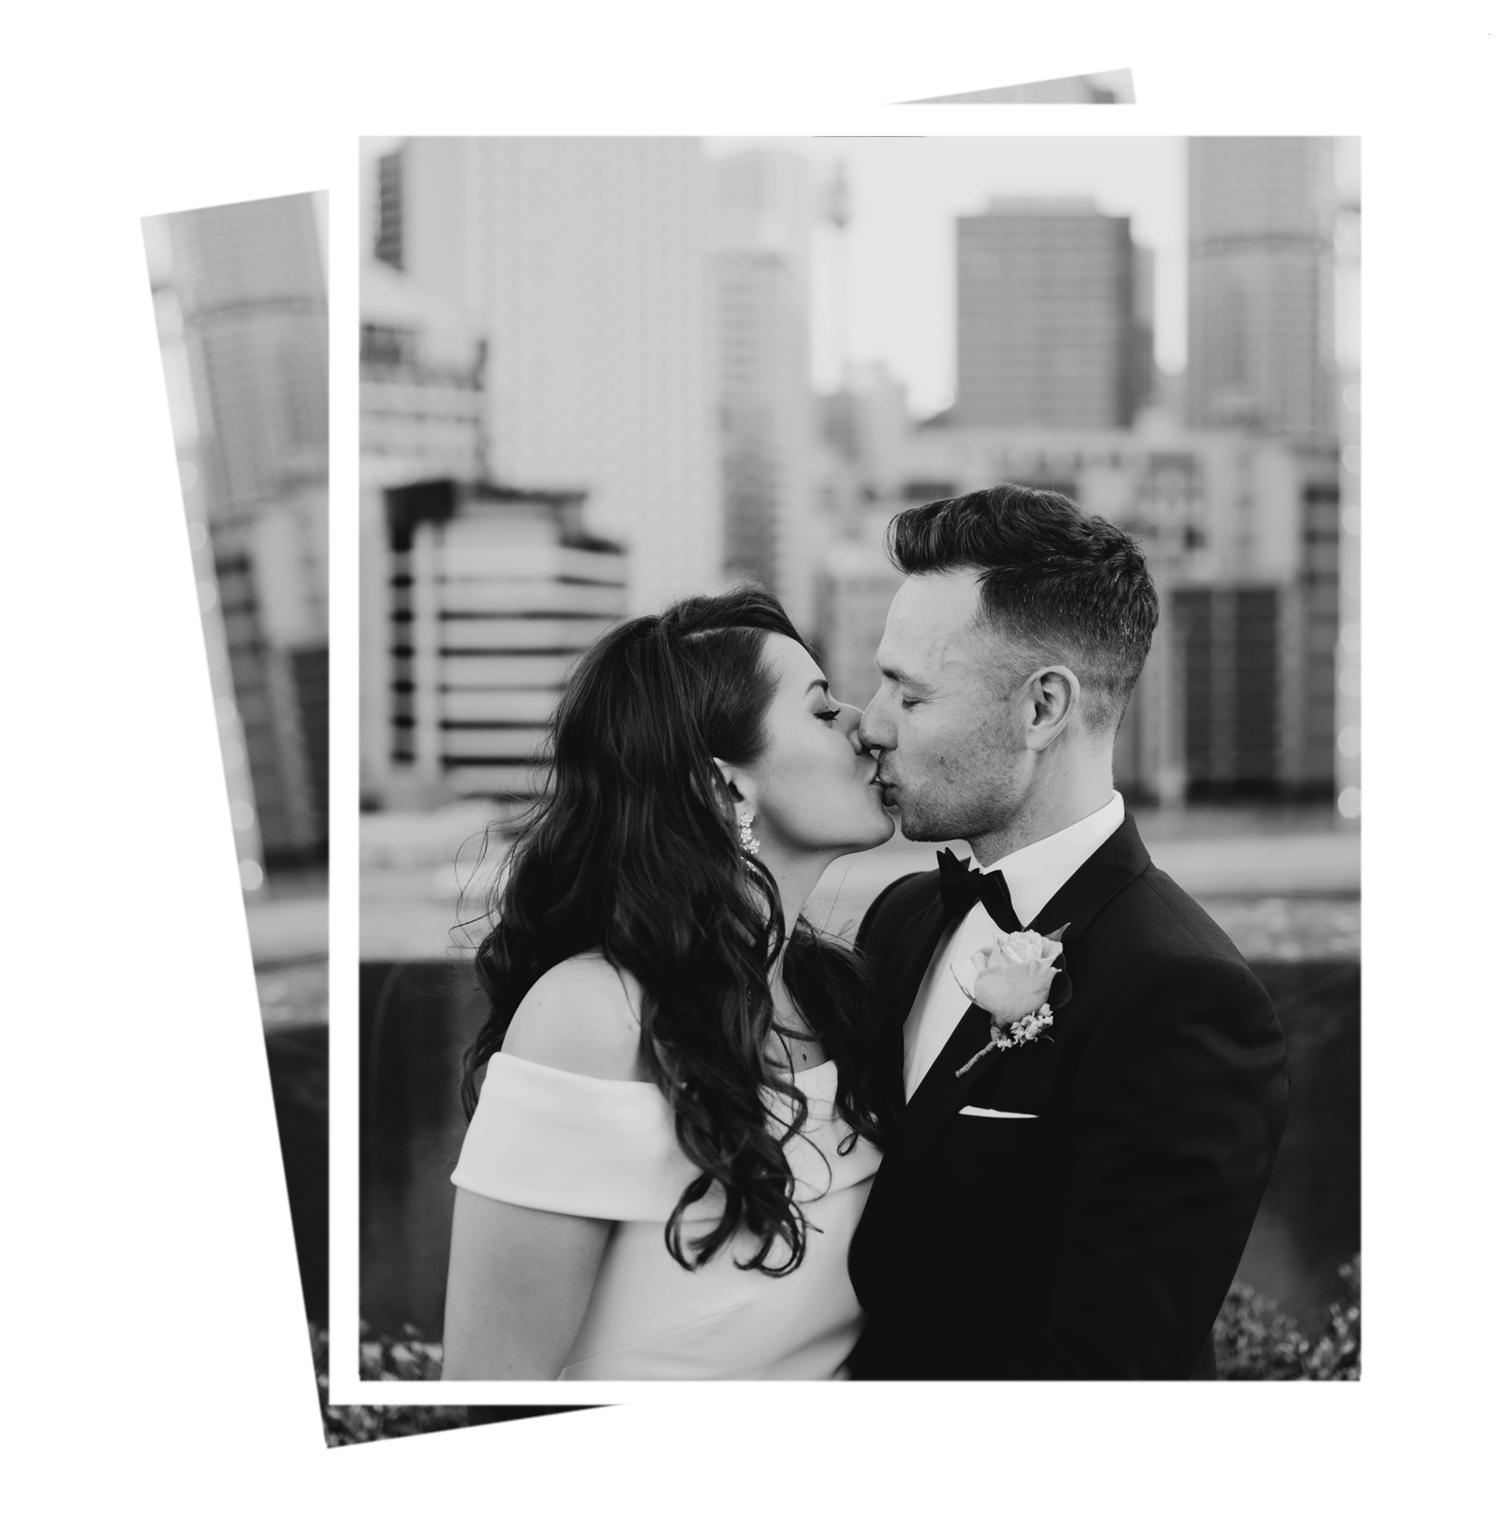 fine art wedding photography sydney_3.png